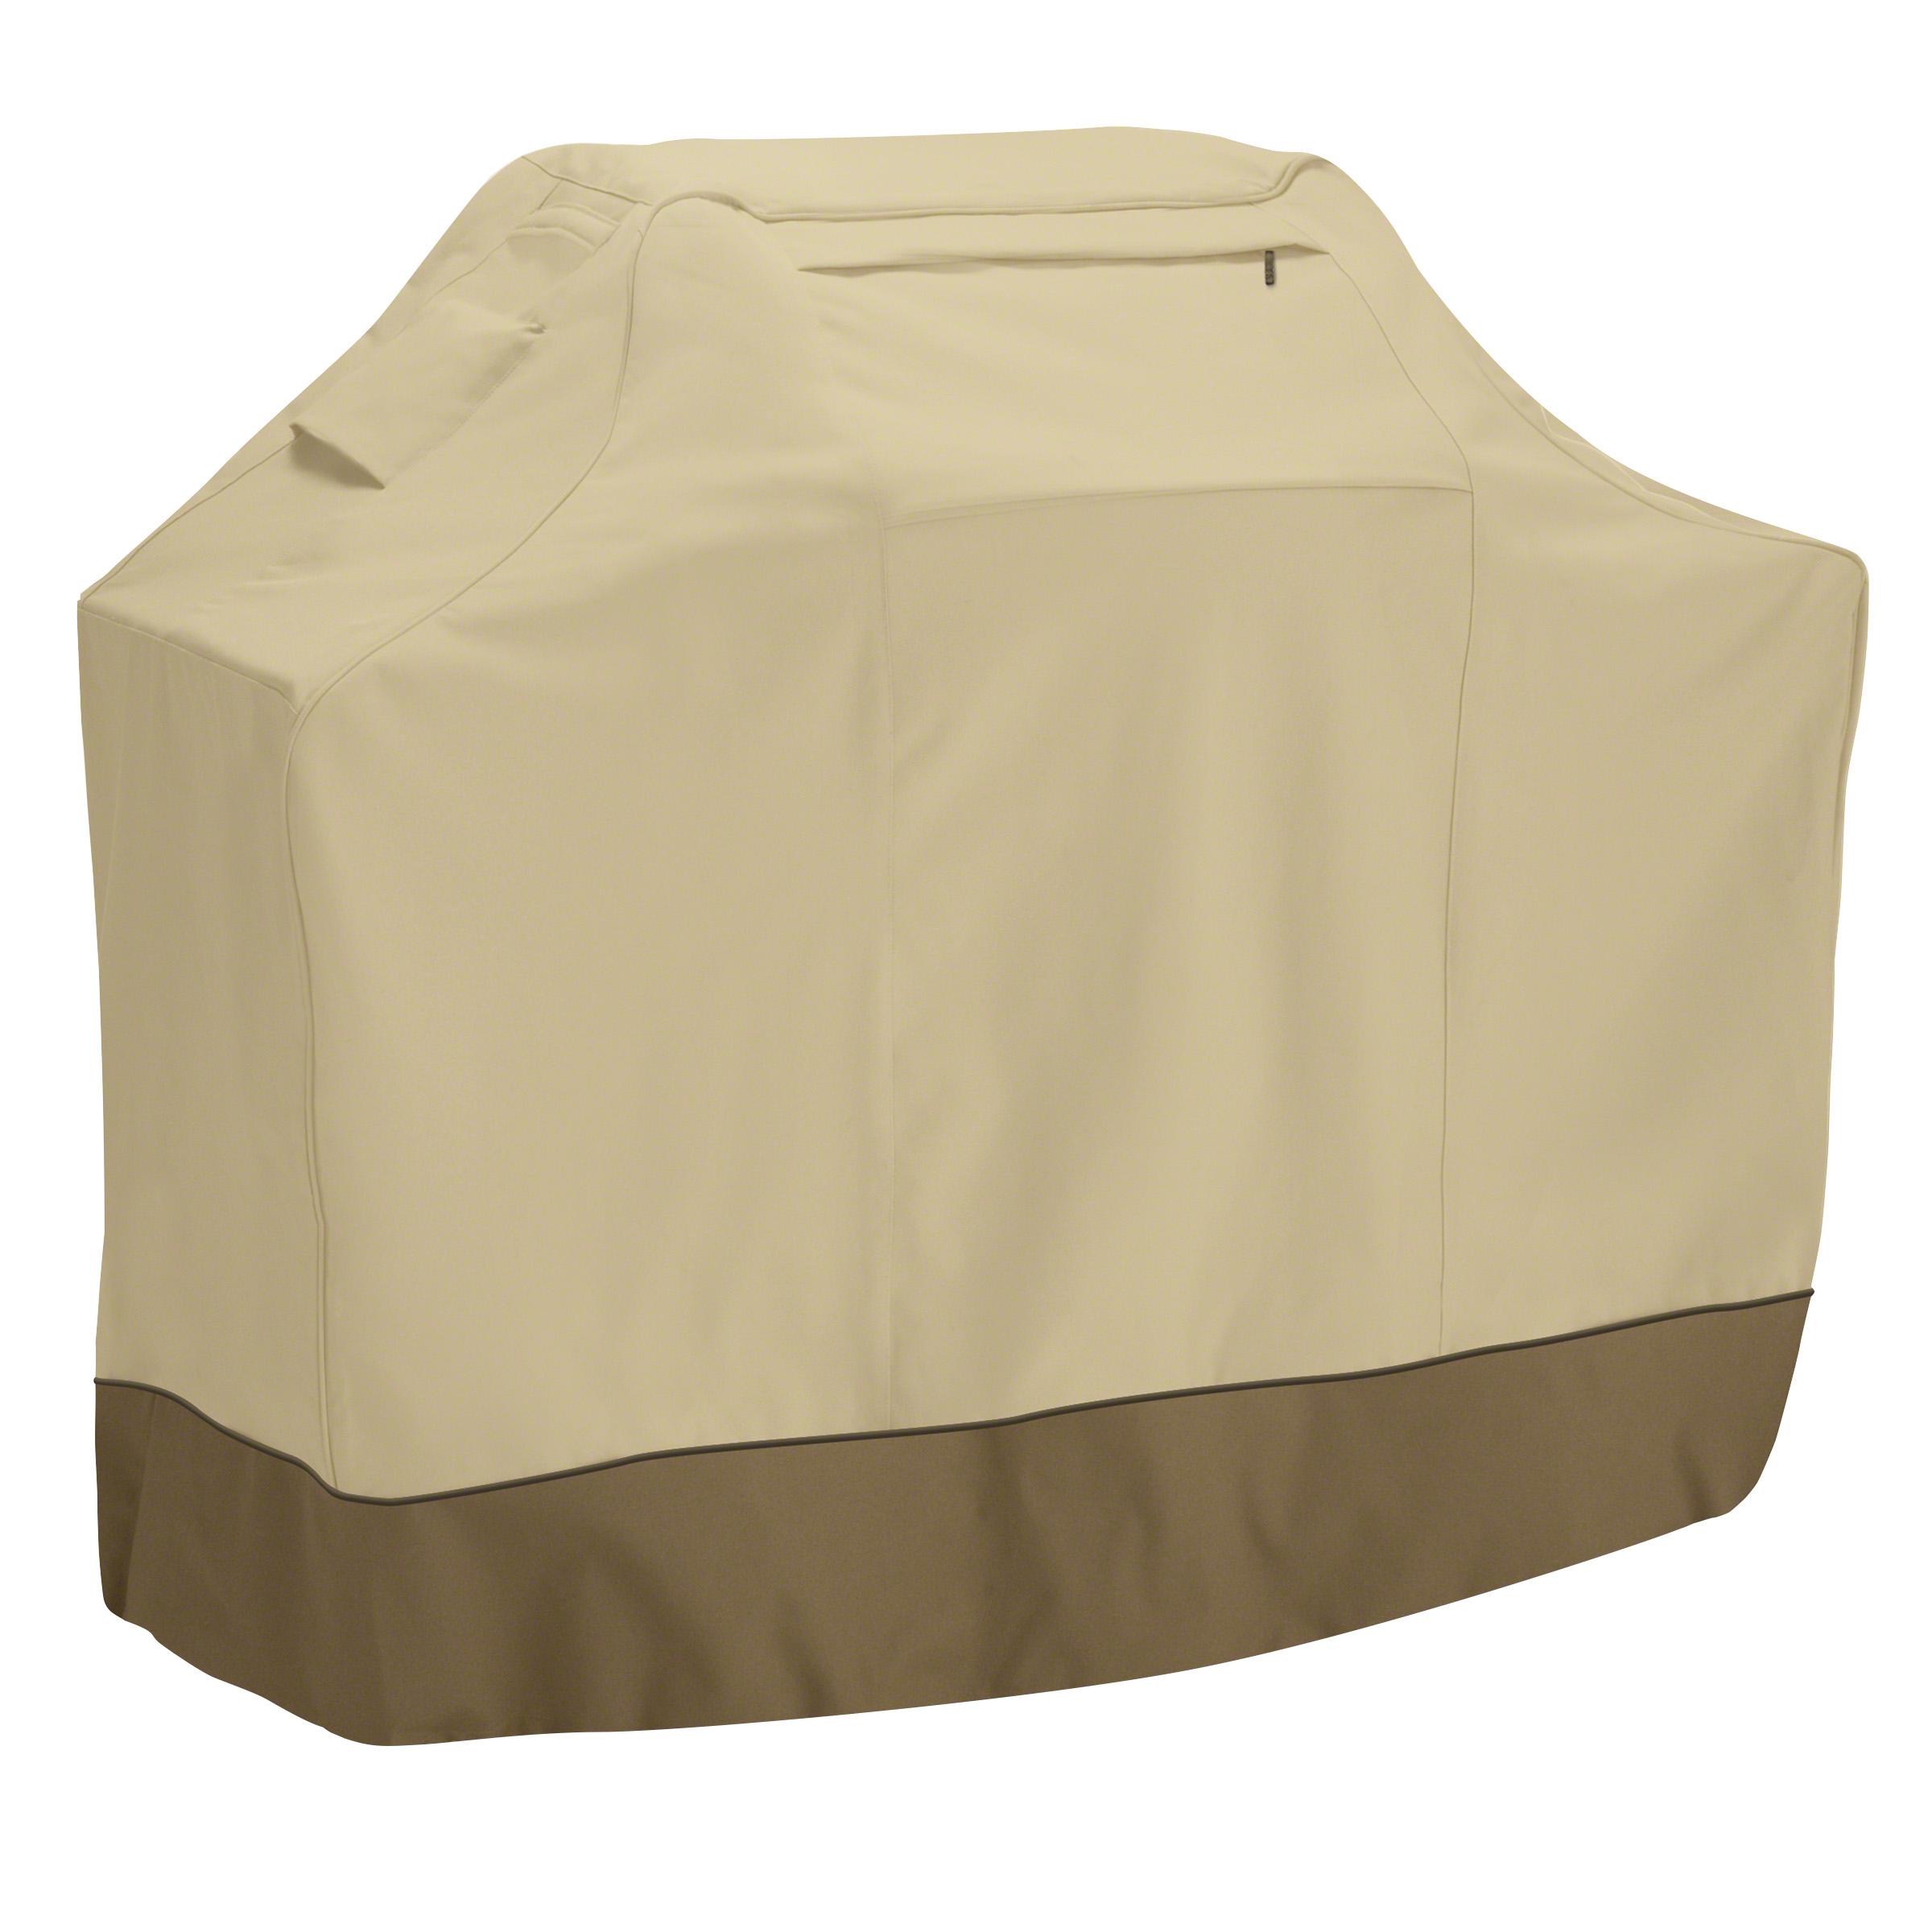 Classic Accessories Veranda Patio BBQ Grill Cover, X-Small PartNumber: 07156906000P KsnValue: 9511757 MfgPartNumber: 55-337-361501-00